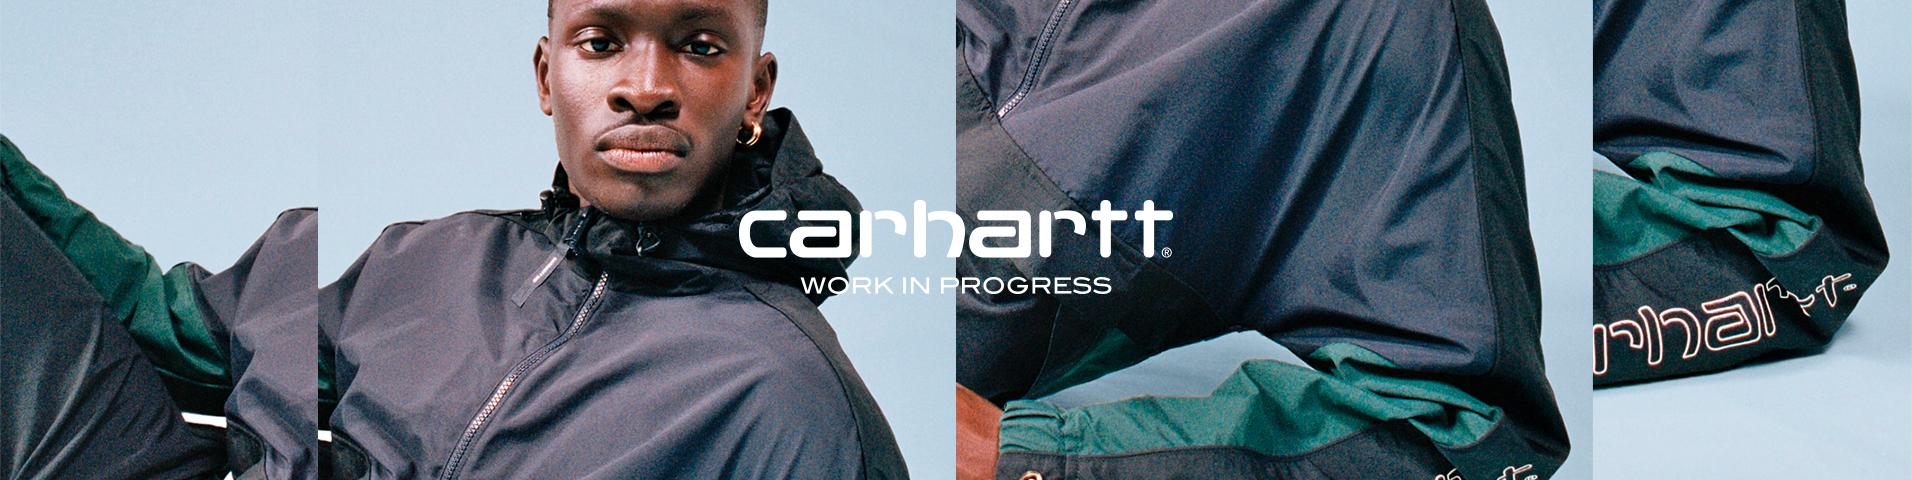 Cappelli Carhartt WIP da uomo  d4dcee90d2b2